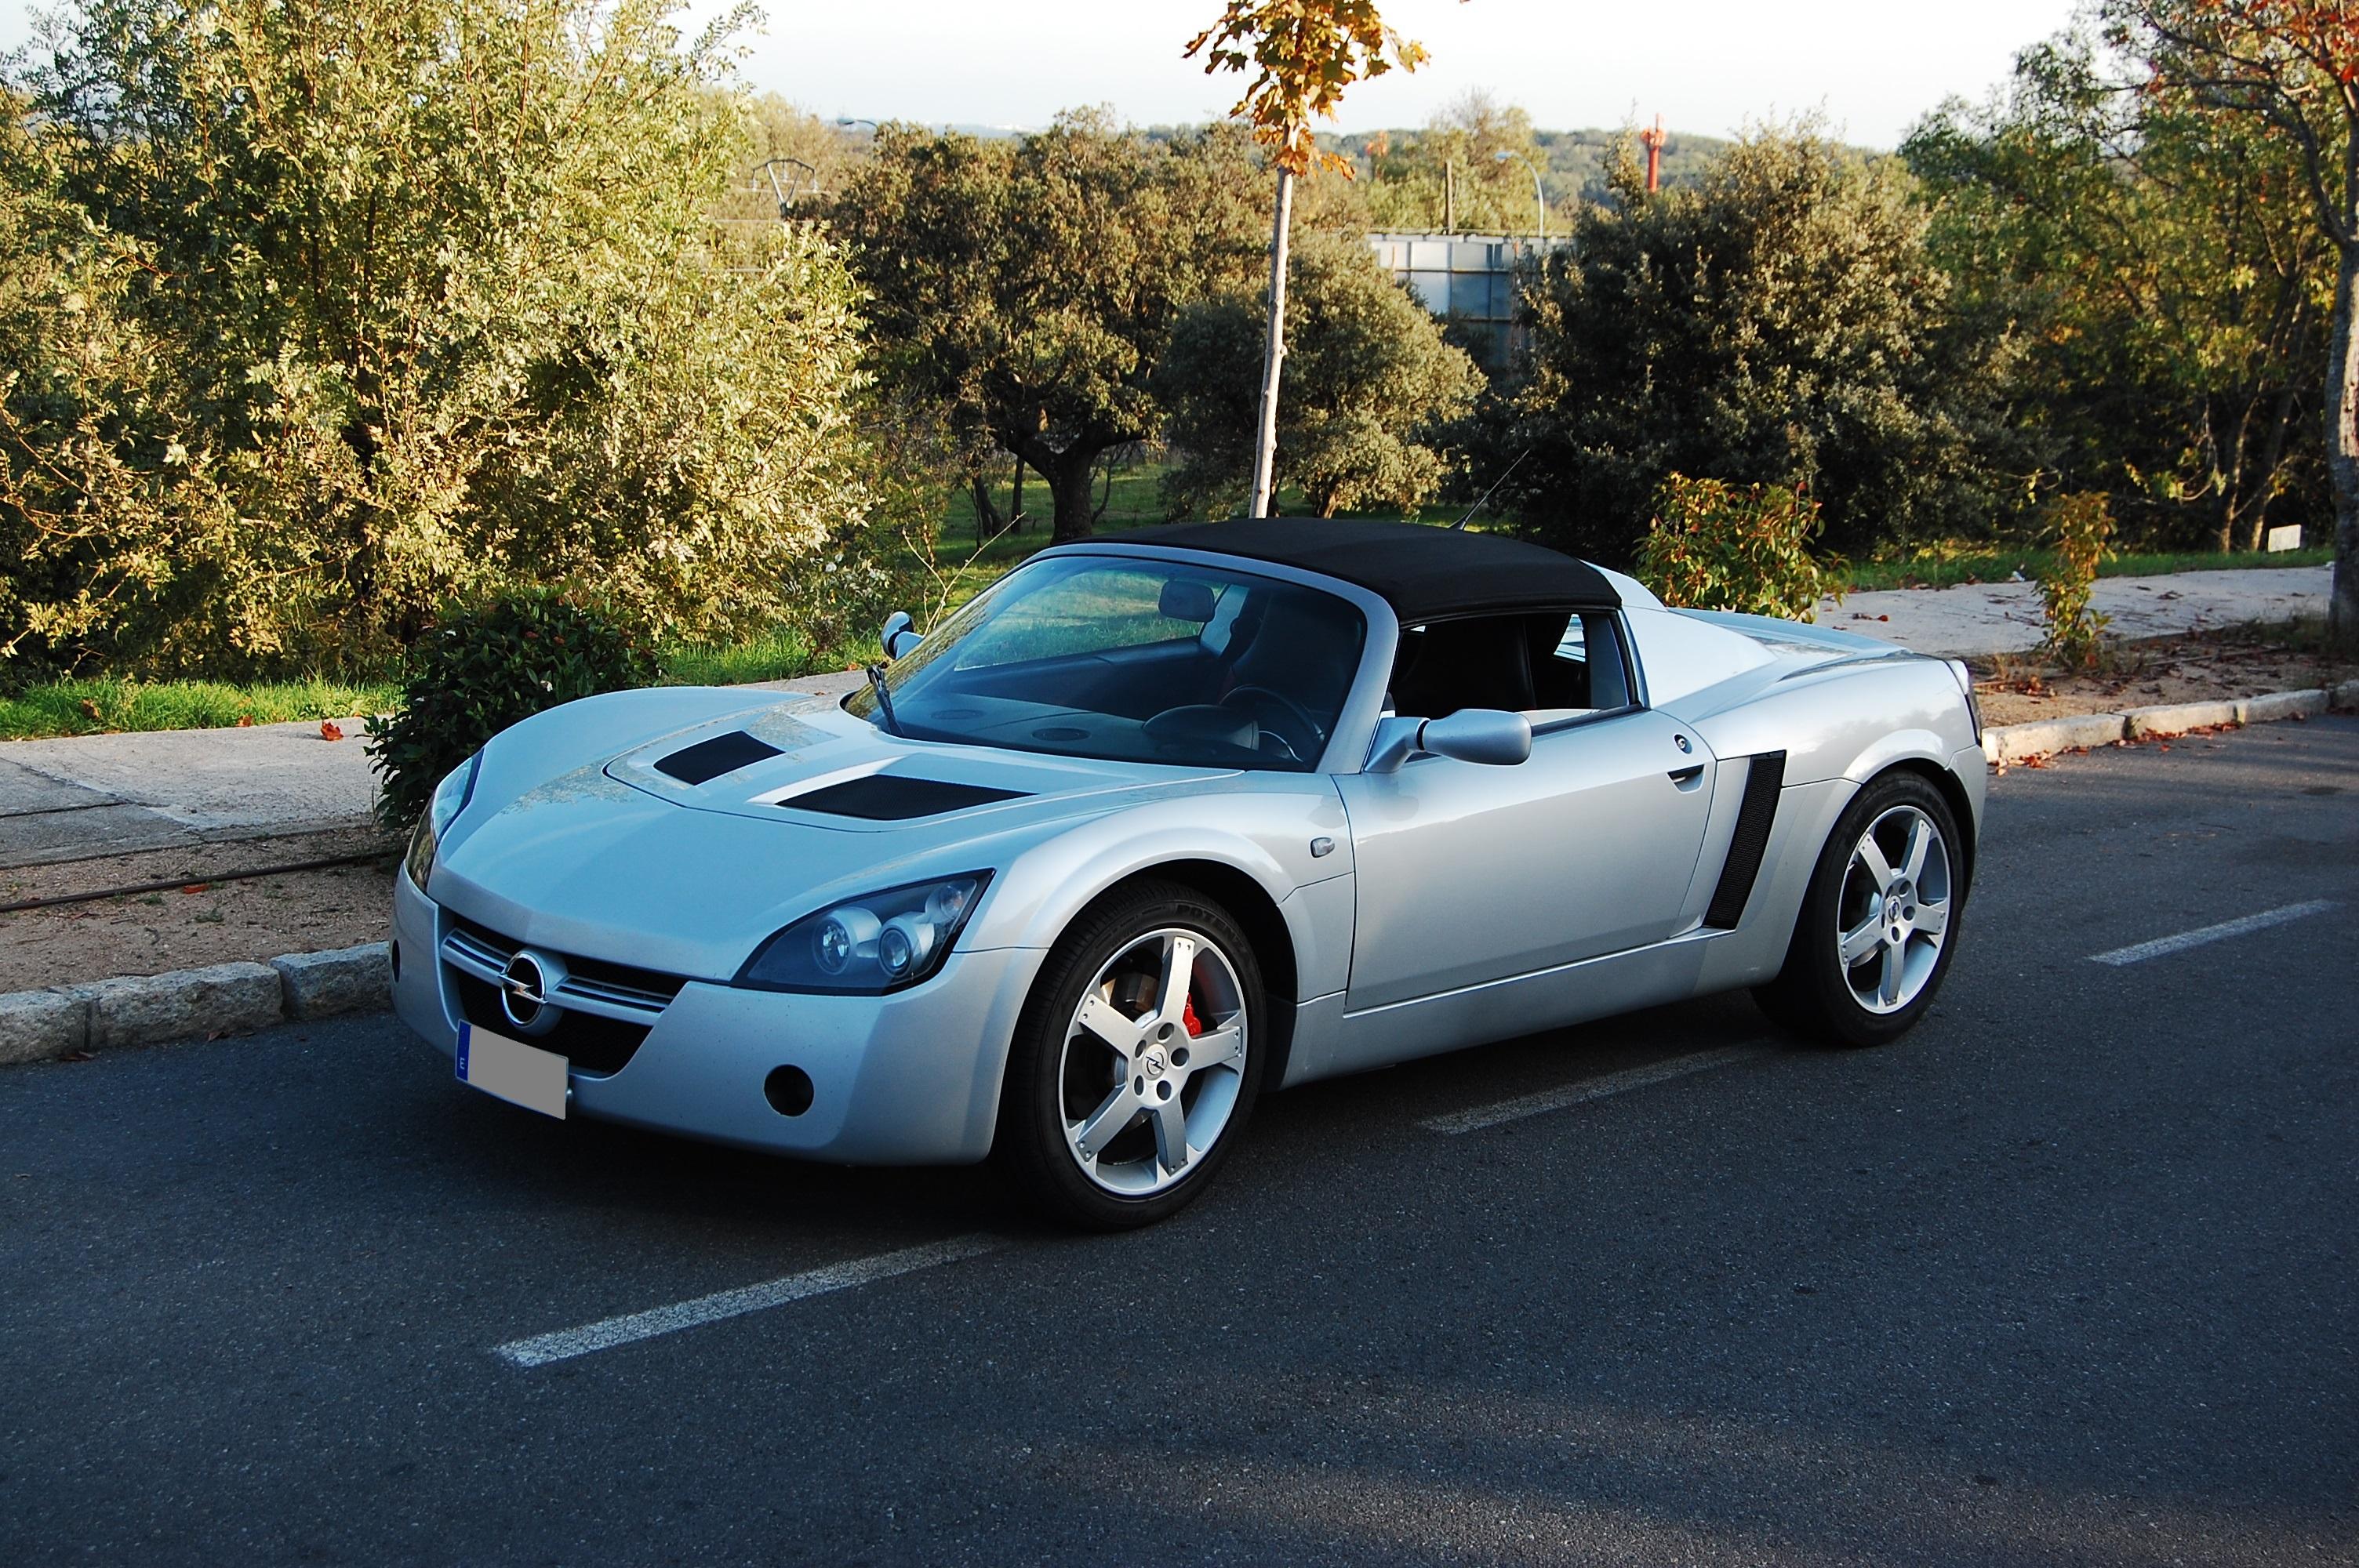 Prueba: Opel Speedster, exotismo alemán con ADN británico